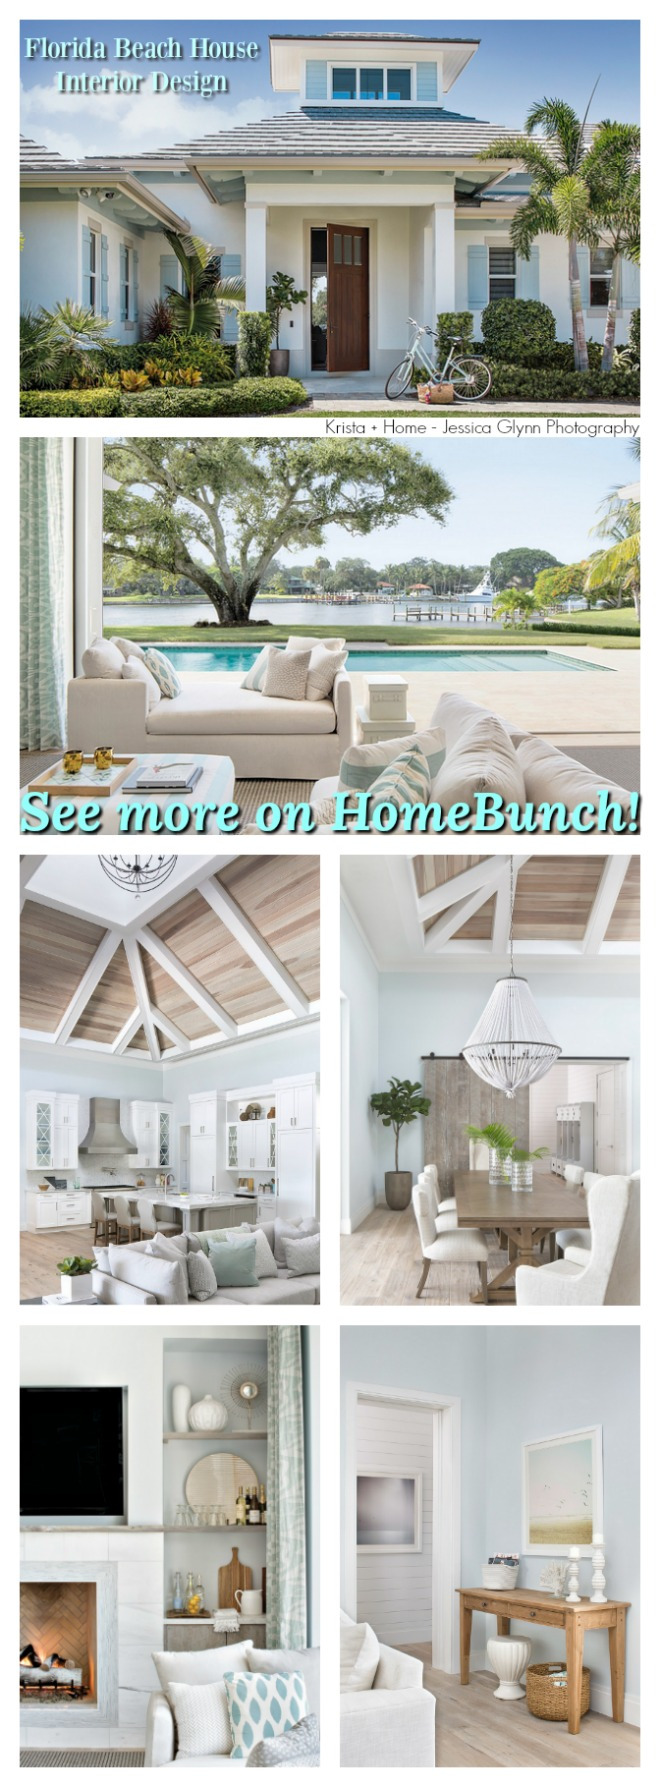 Florida Beach House Interior Design